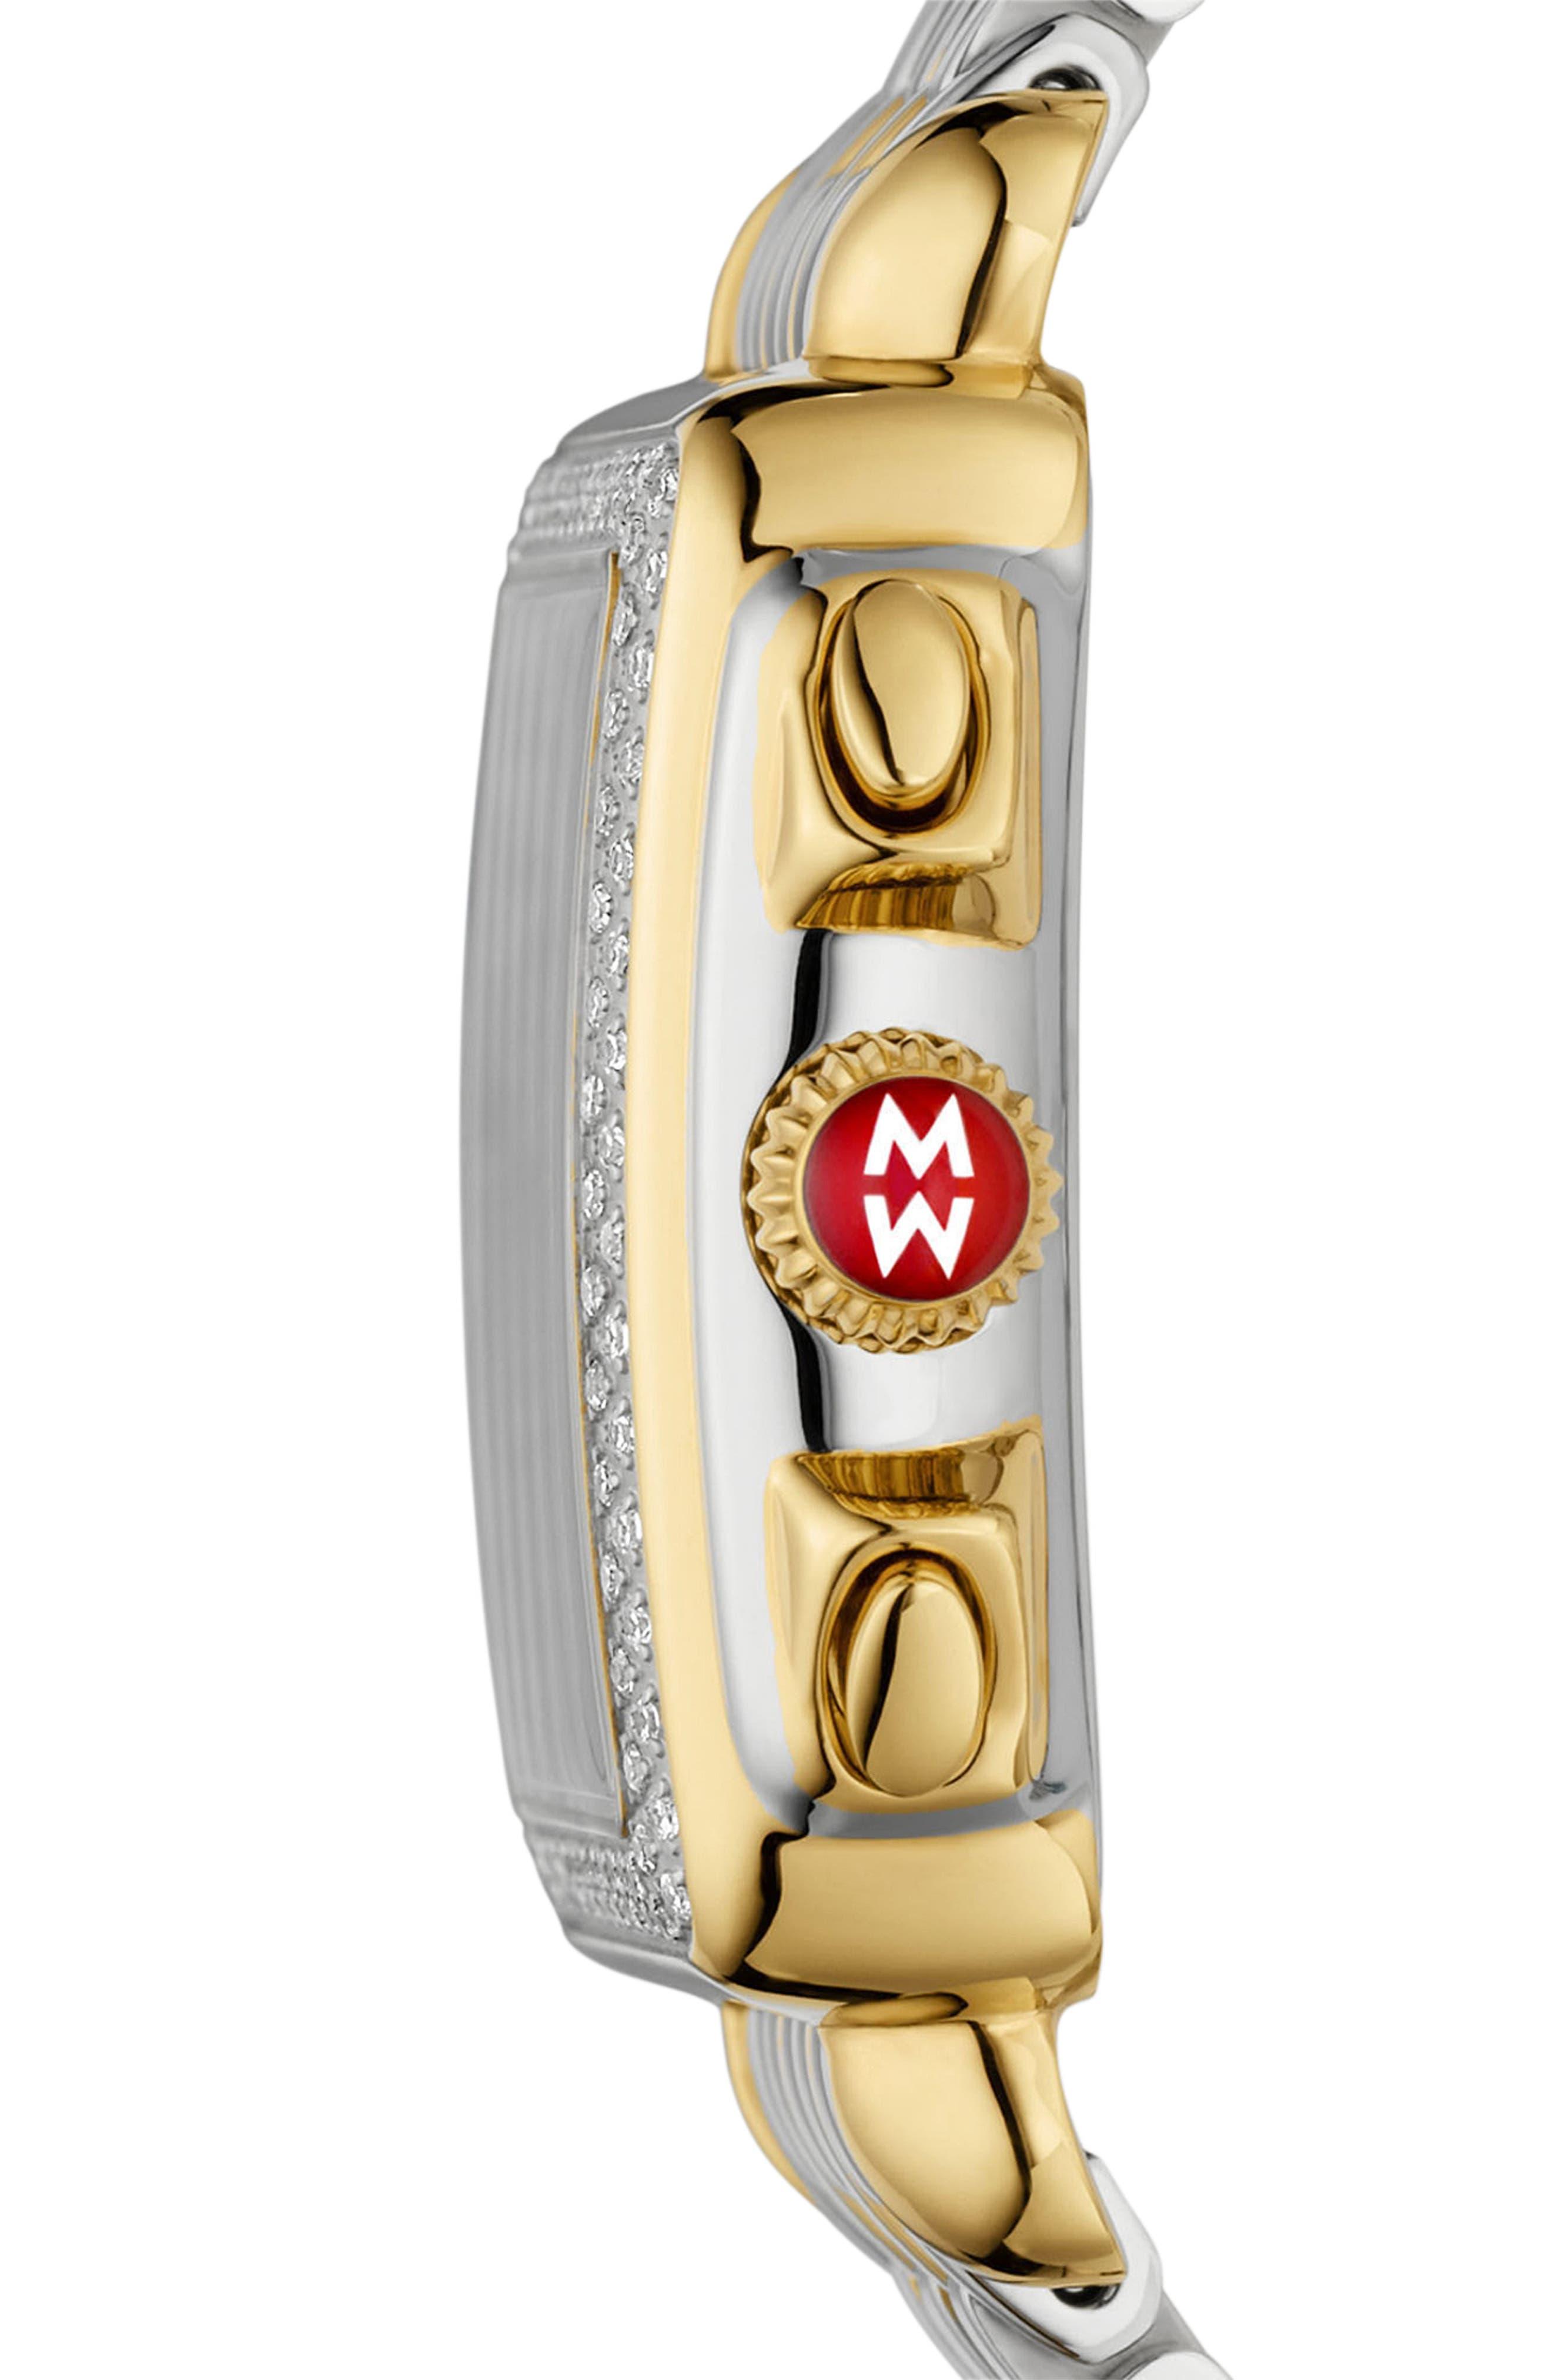 Deco Diamond Diamond Dial Watch Head, 33mm x 35mm,                             Alternate thumbnail 3, color,                             GOLD/ SILVER/ DESERT ROSE MOP